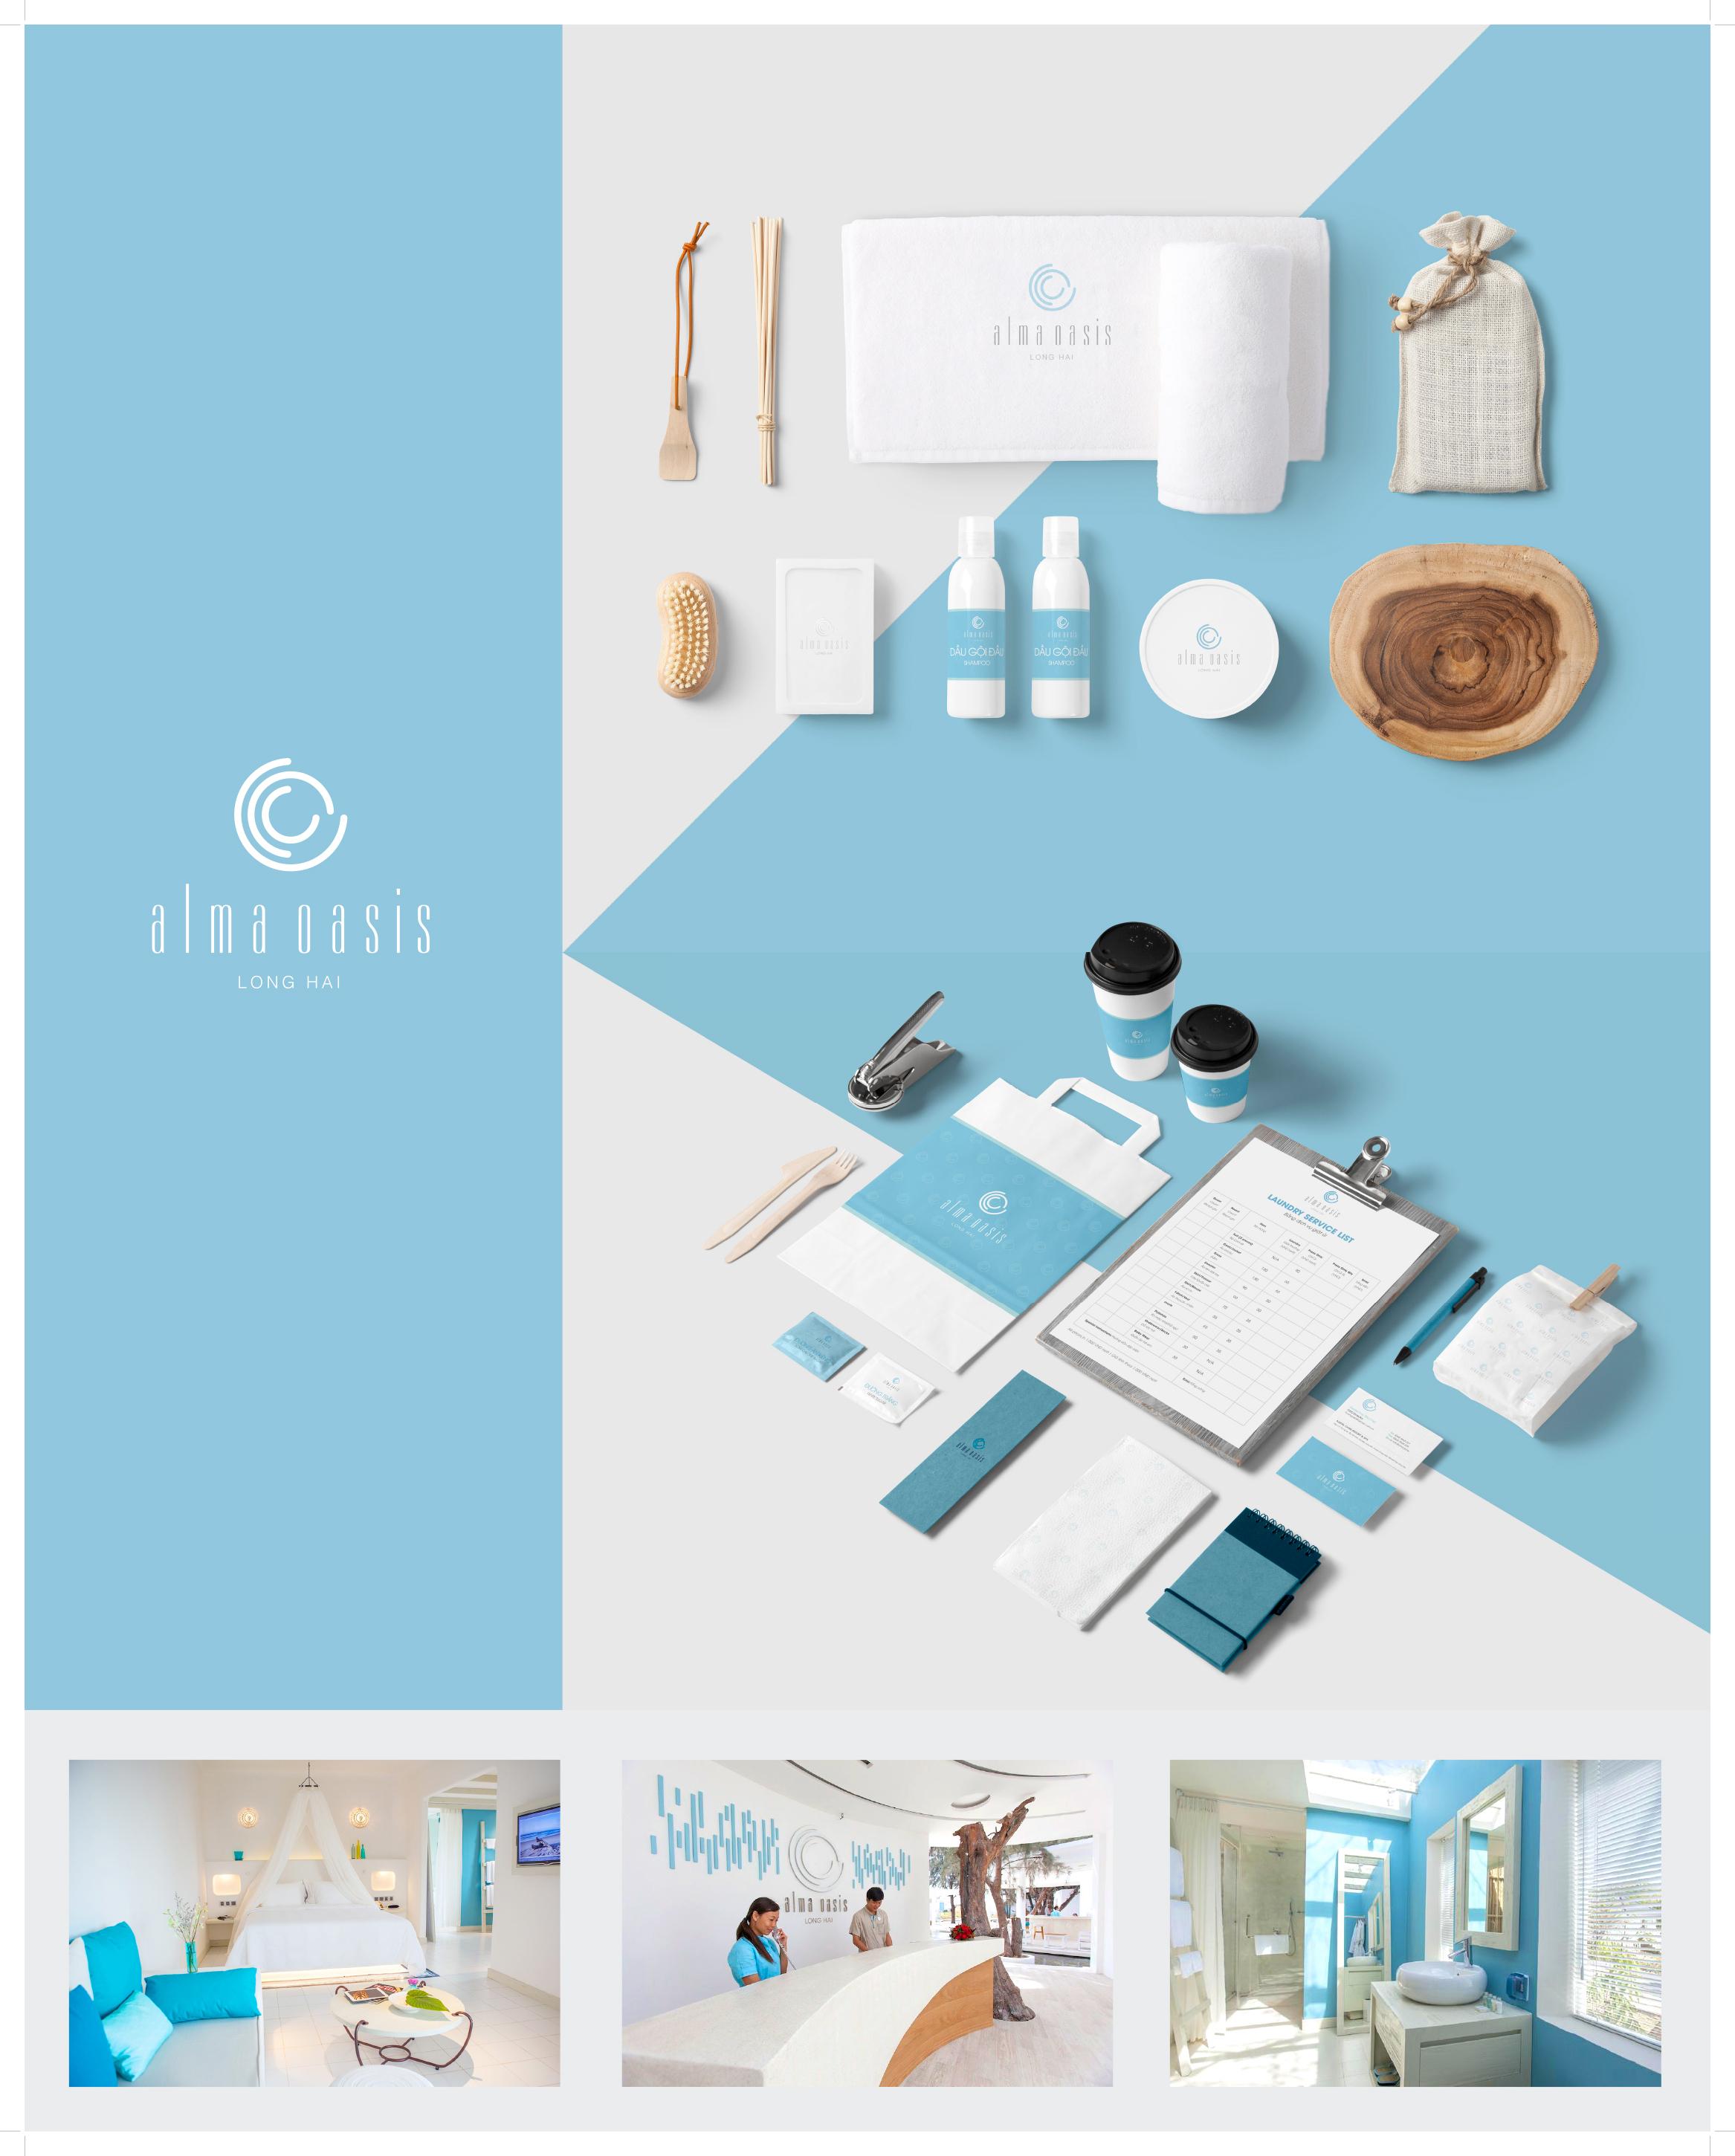 Graphic Design - Đăng Khoa